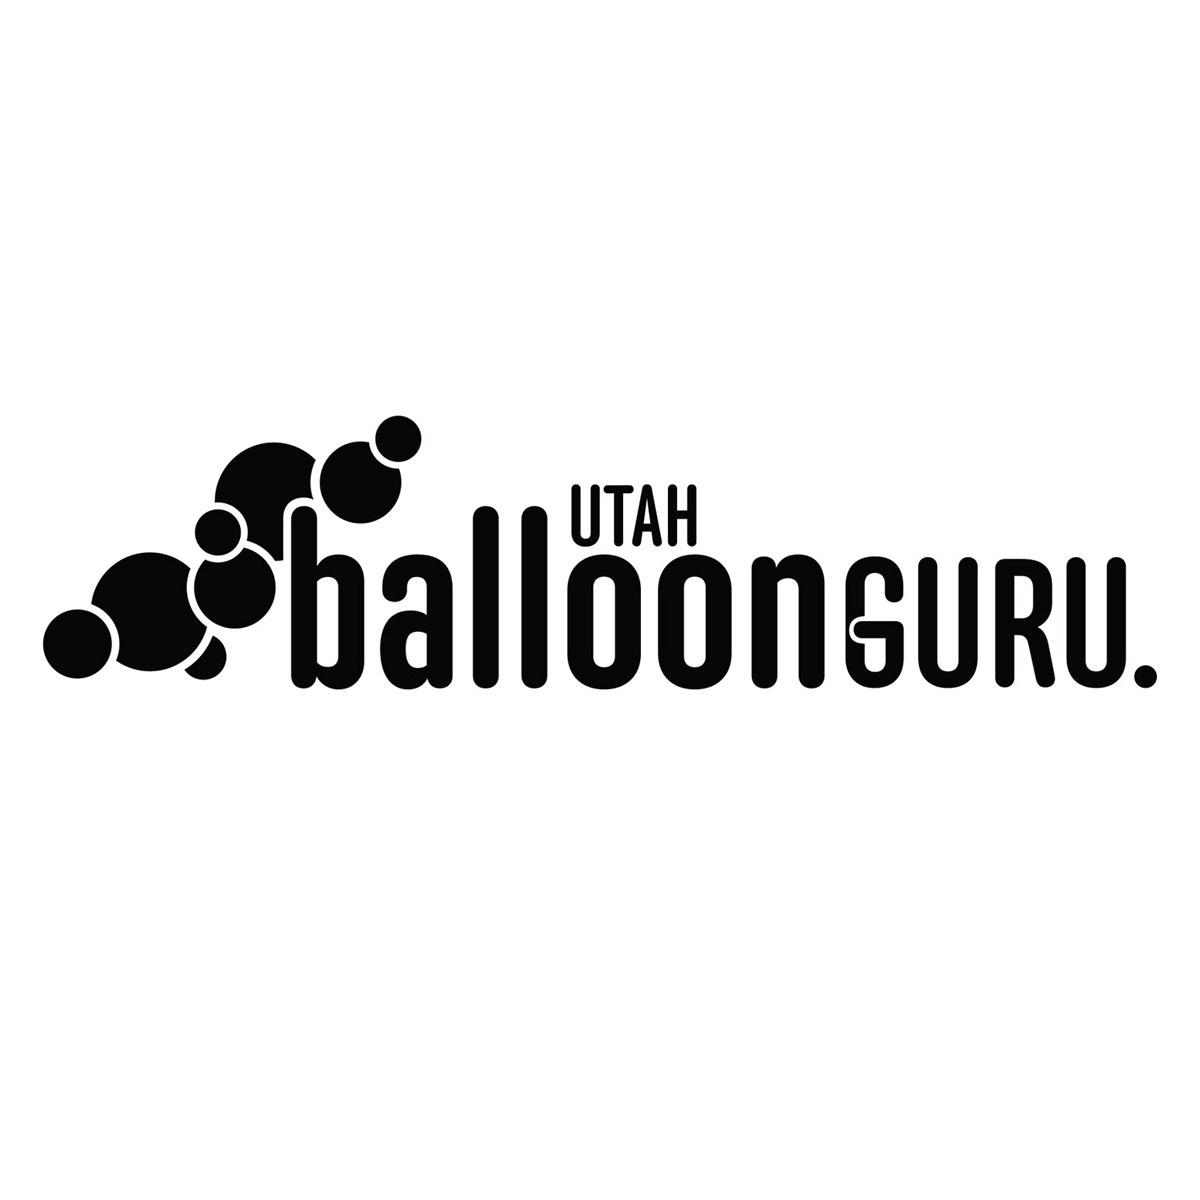 Utah Balloon Guru